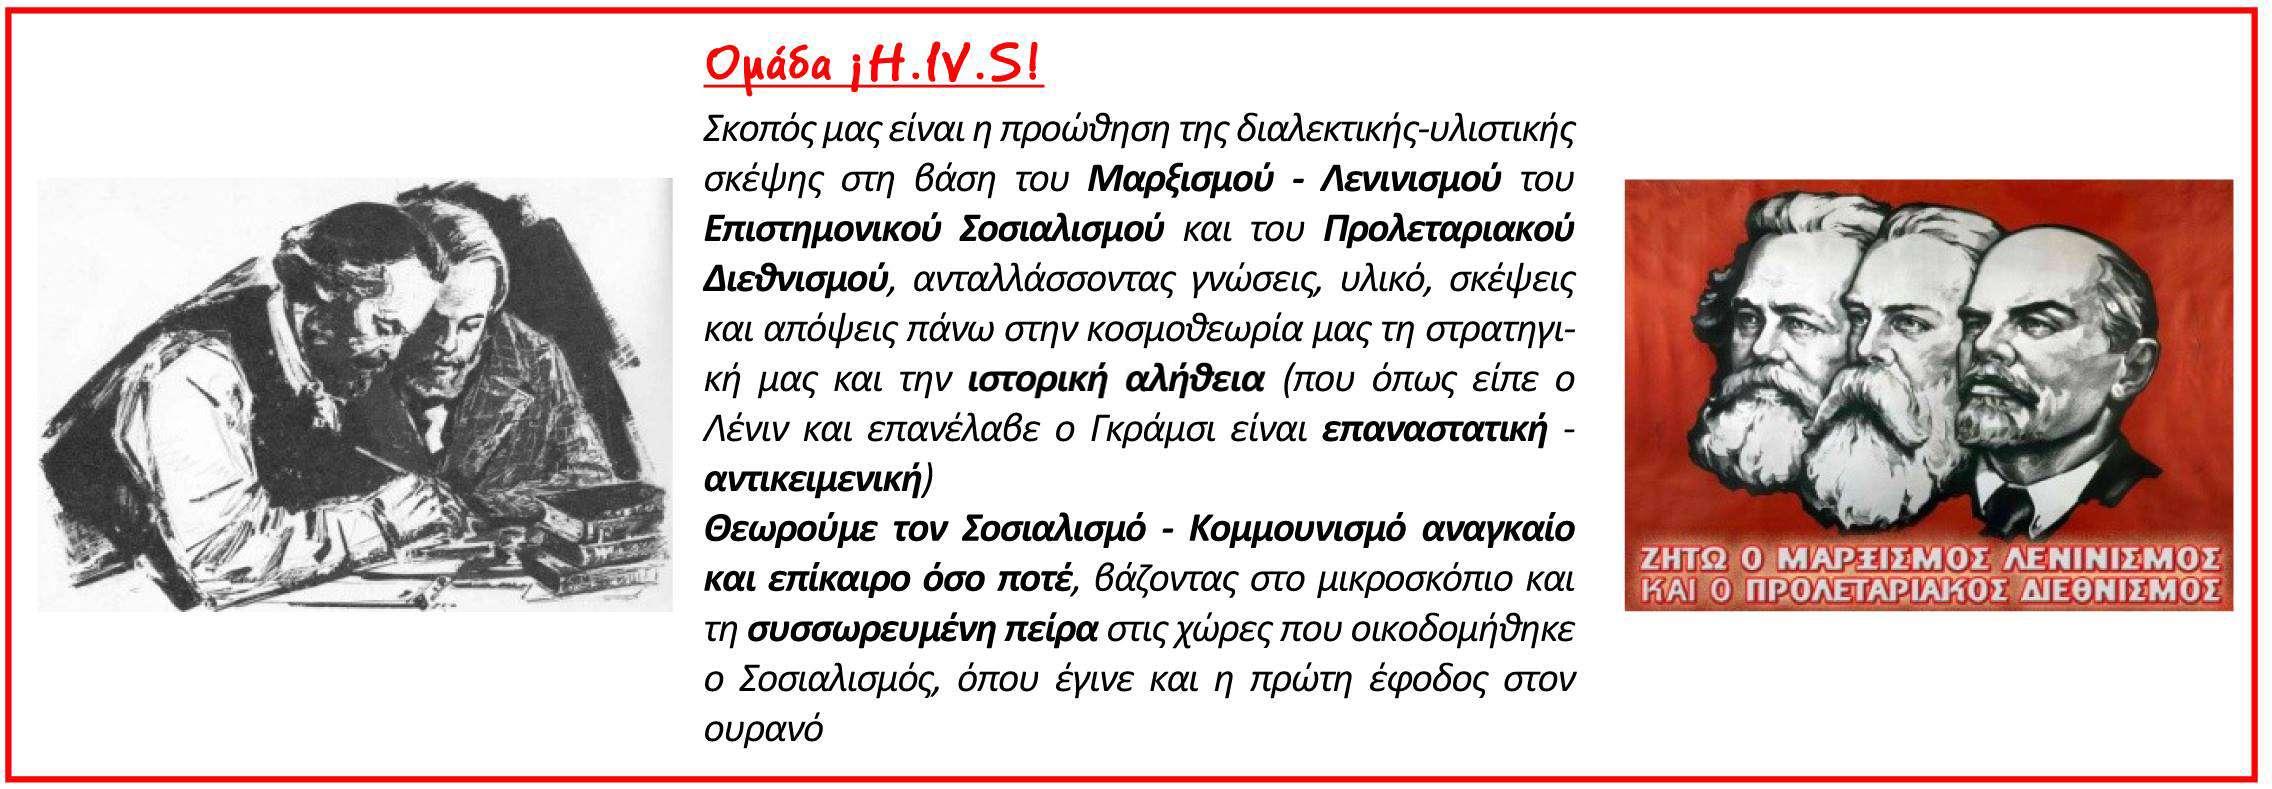 ¡H.lV .S 6 1